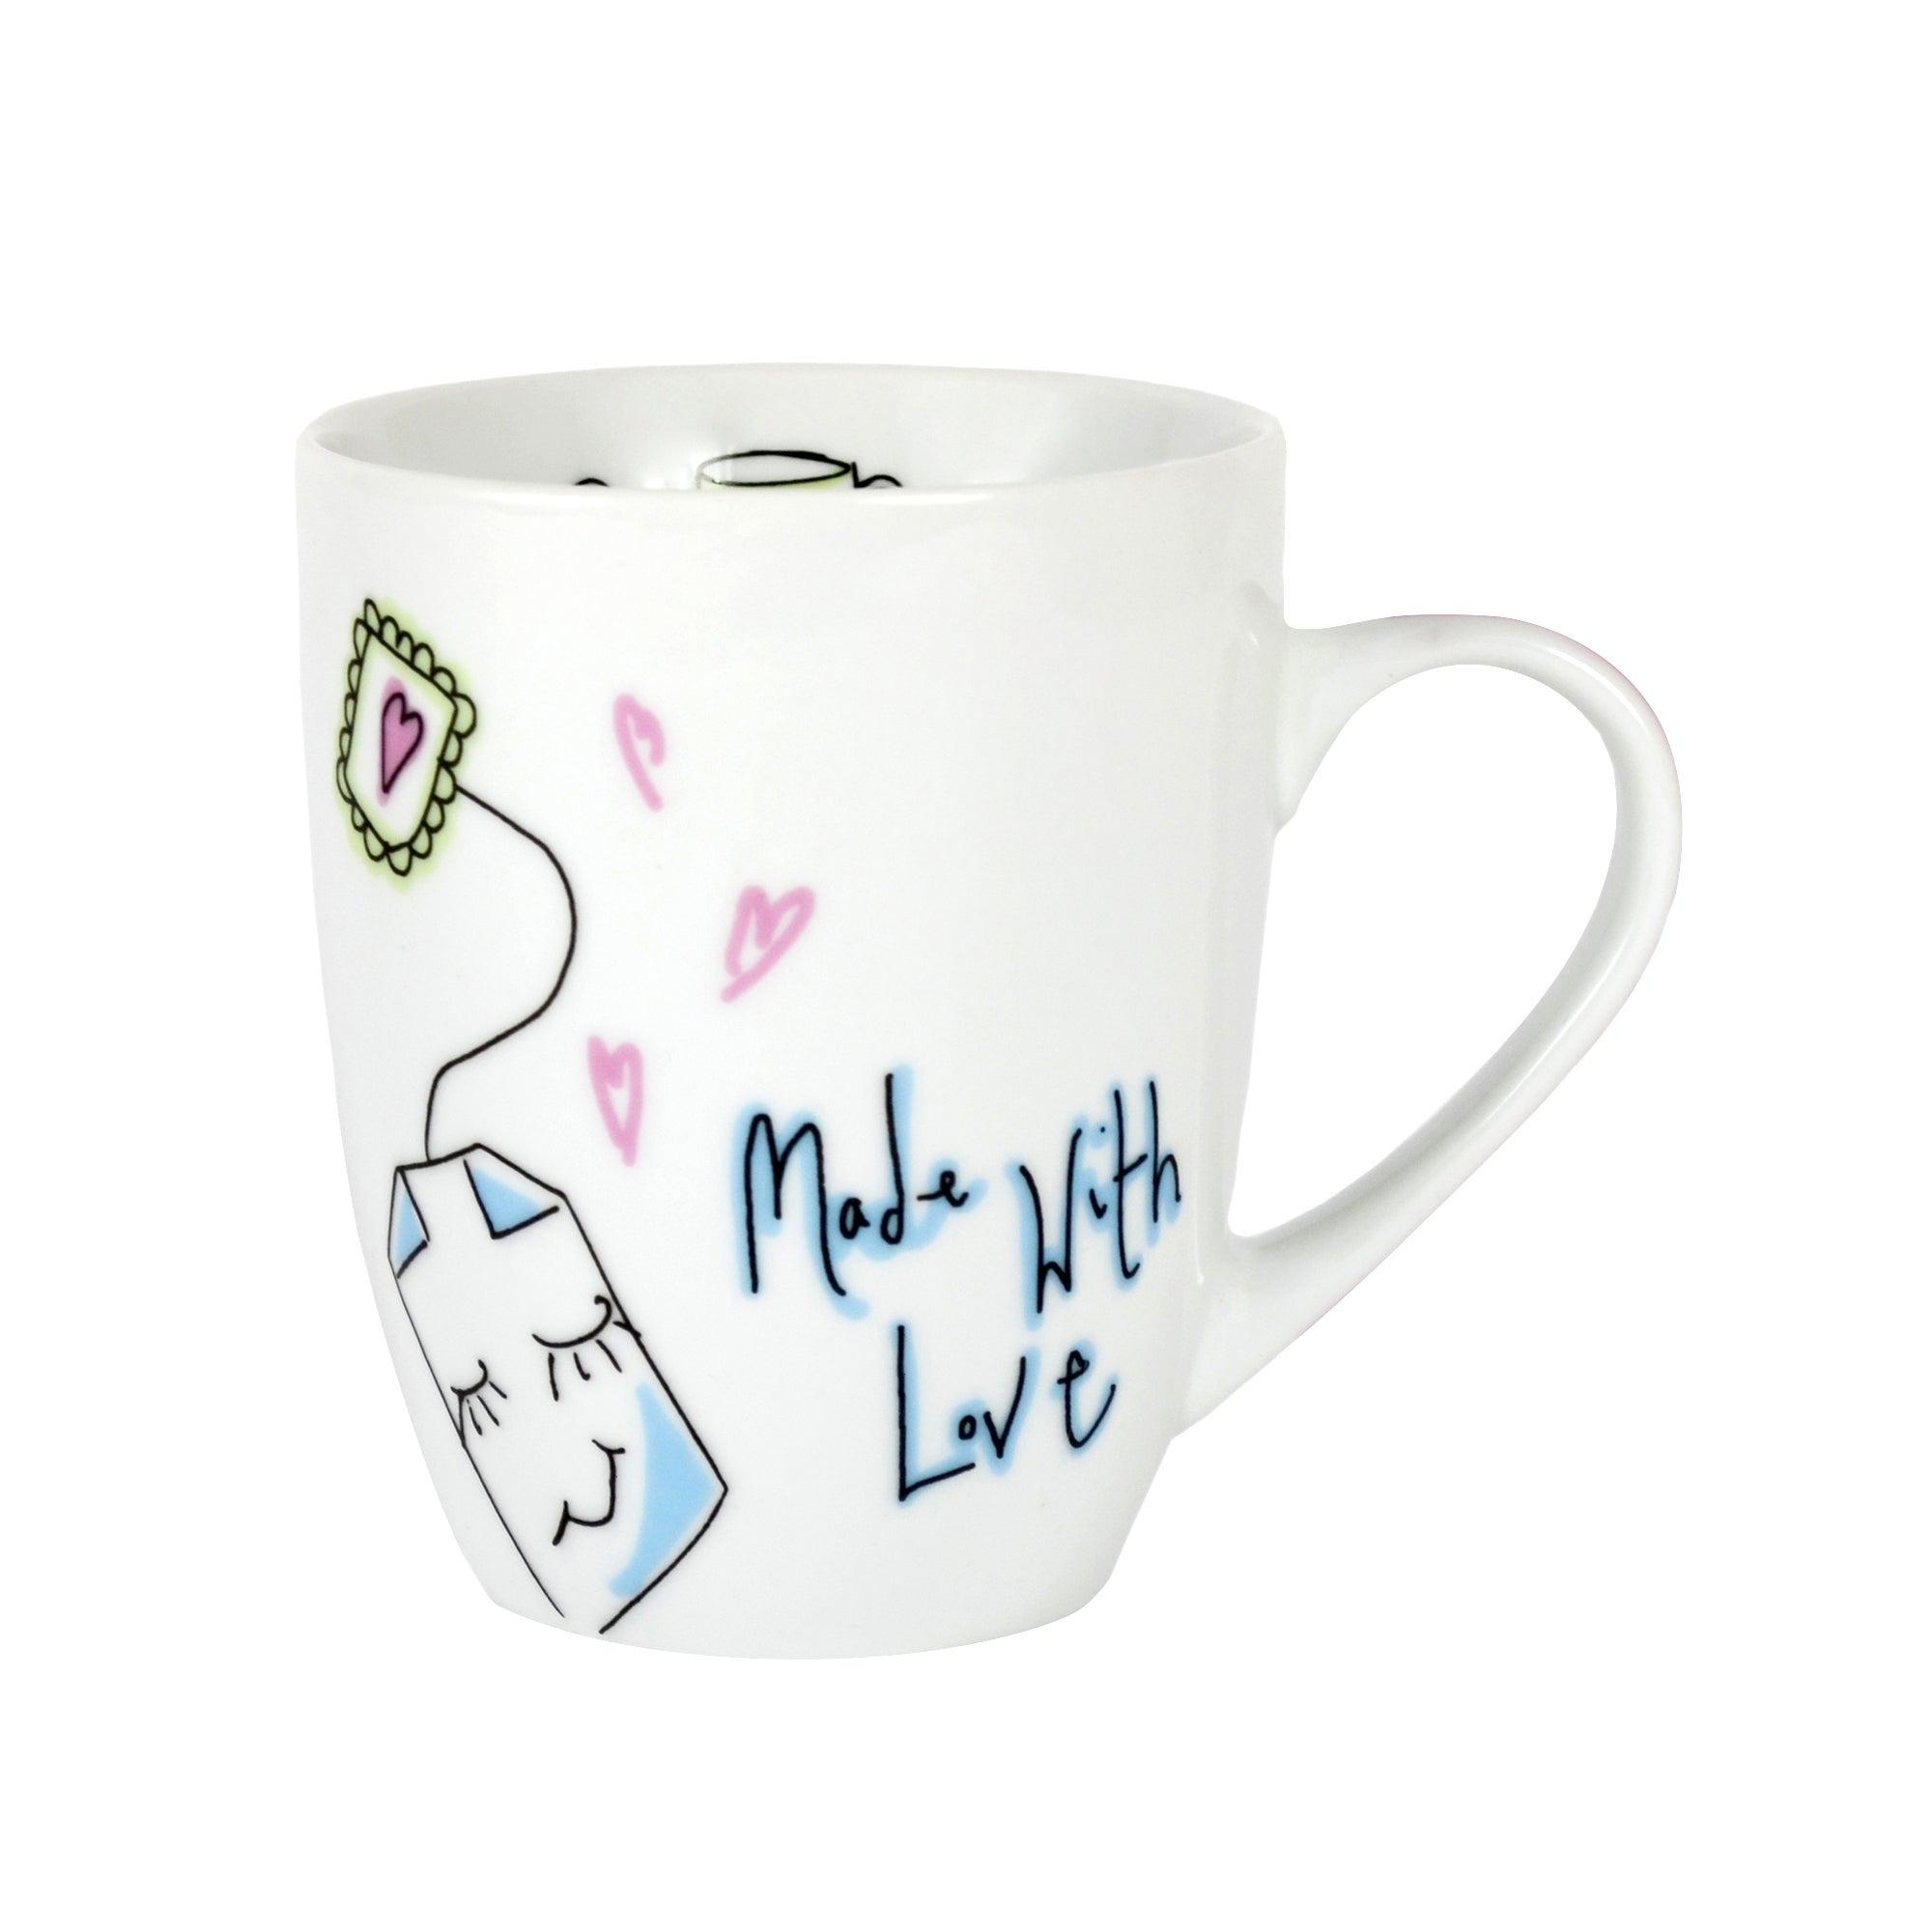 Made with Love Mug